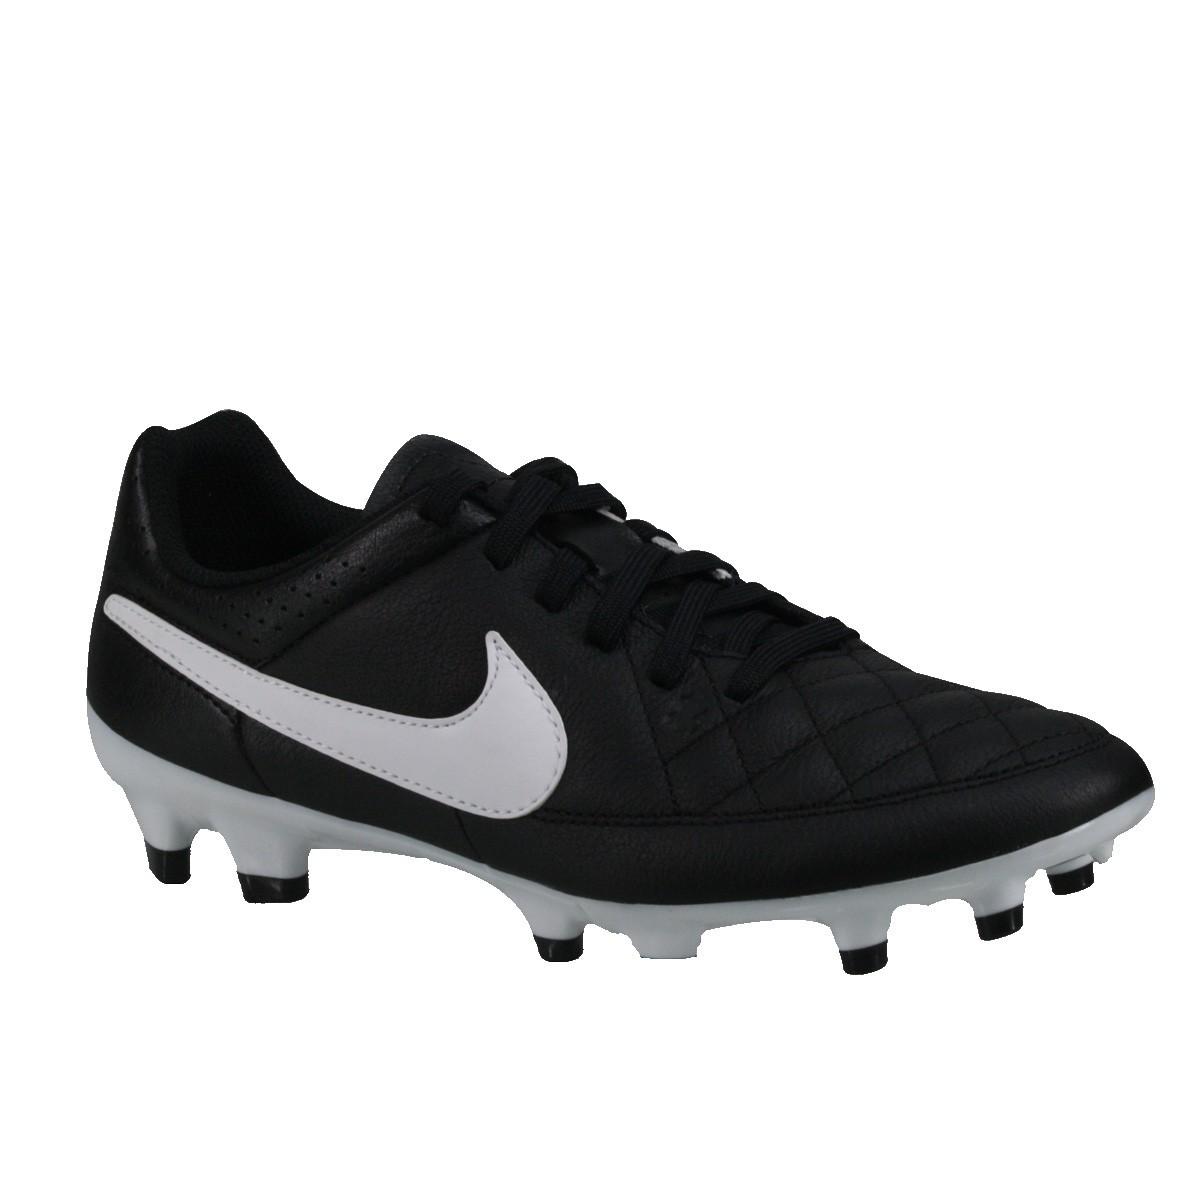 776536ca4c529 Chuteira Futebol de Campo Nike 631282-010 - Preto/branco   Bizz Store